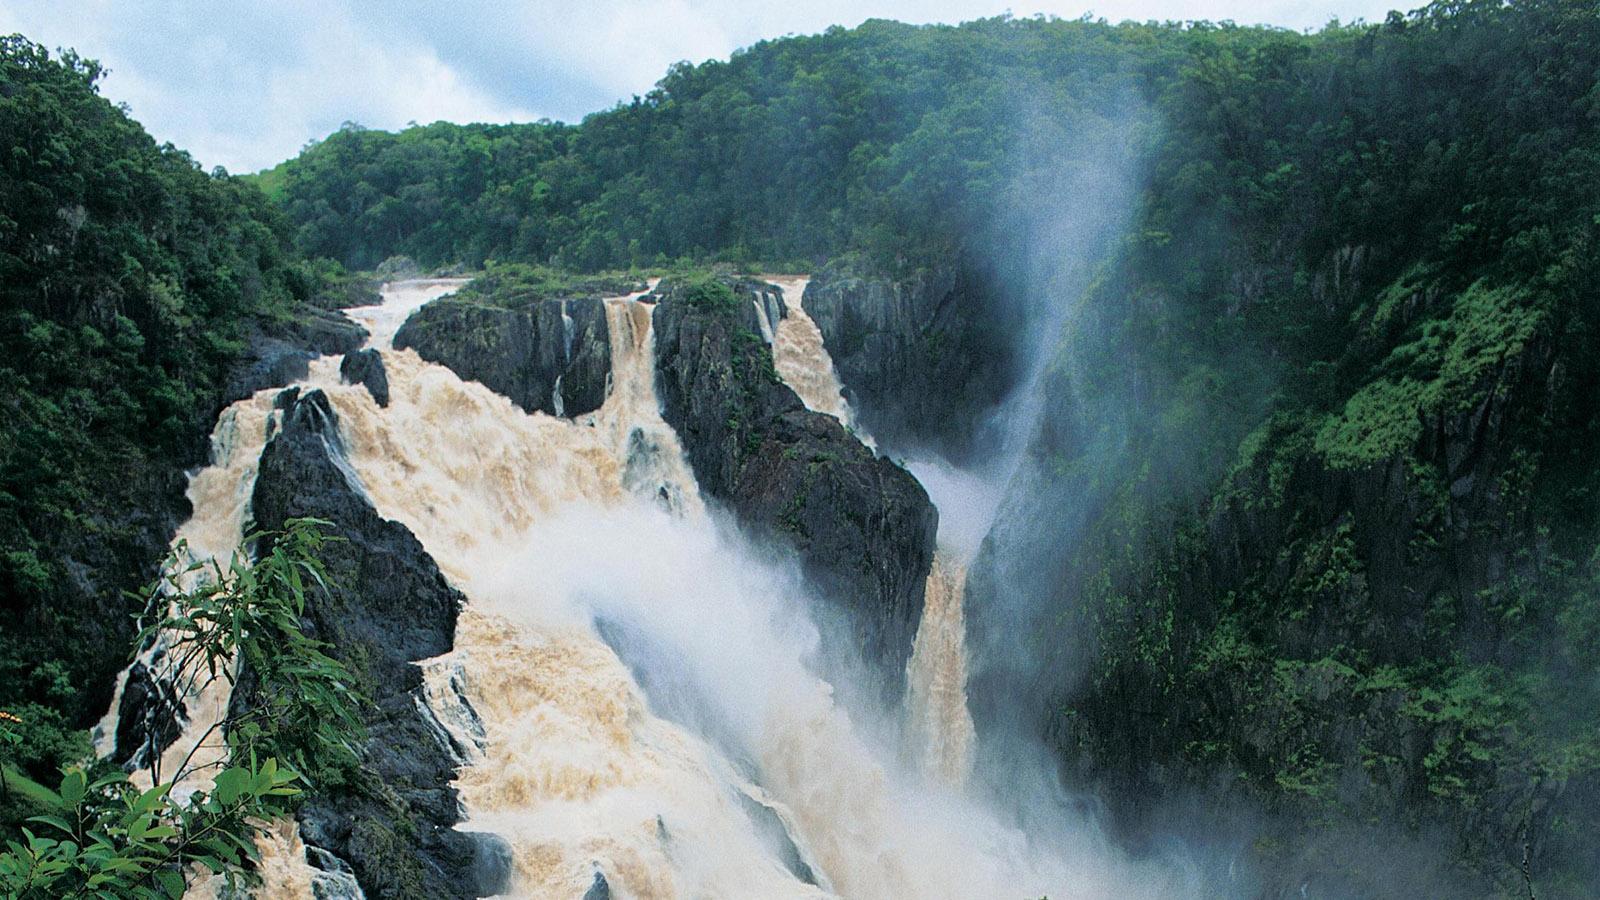 Mal rauschend, mal ein dünnes Rinnsal: die Barron Falls. Foto: Skyrail/Pressebild.